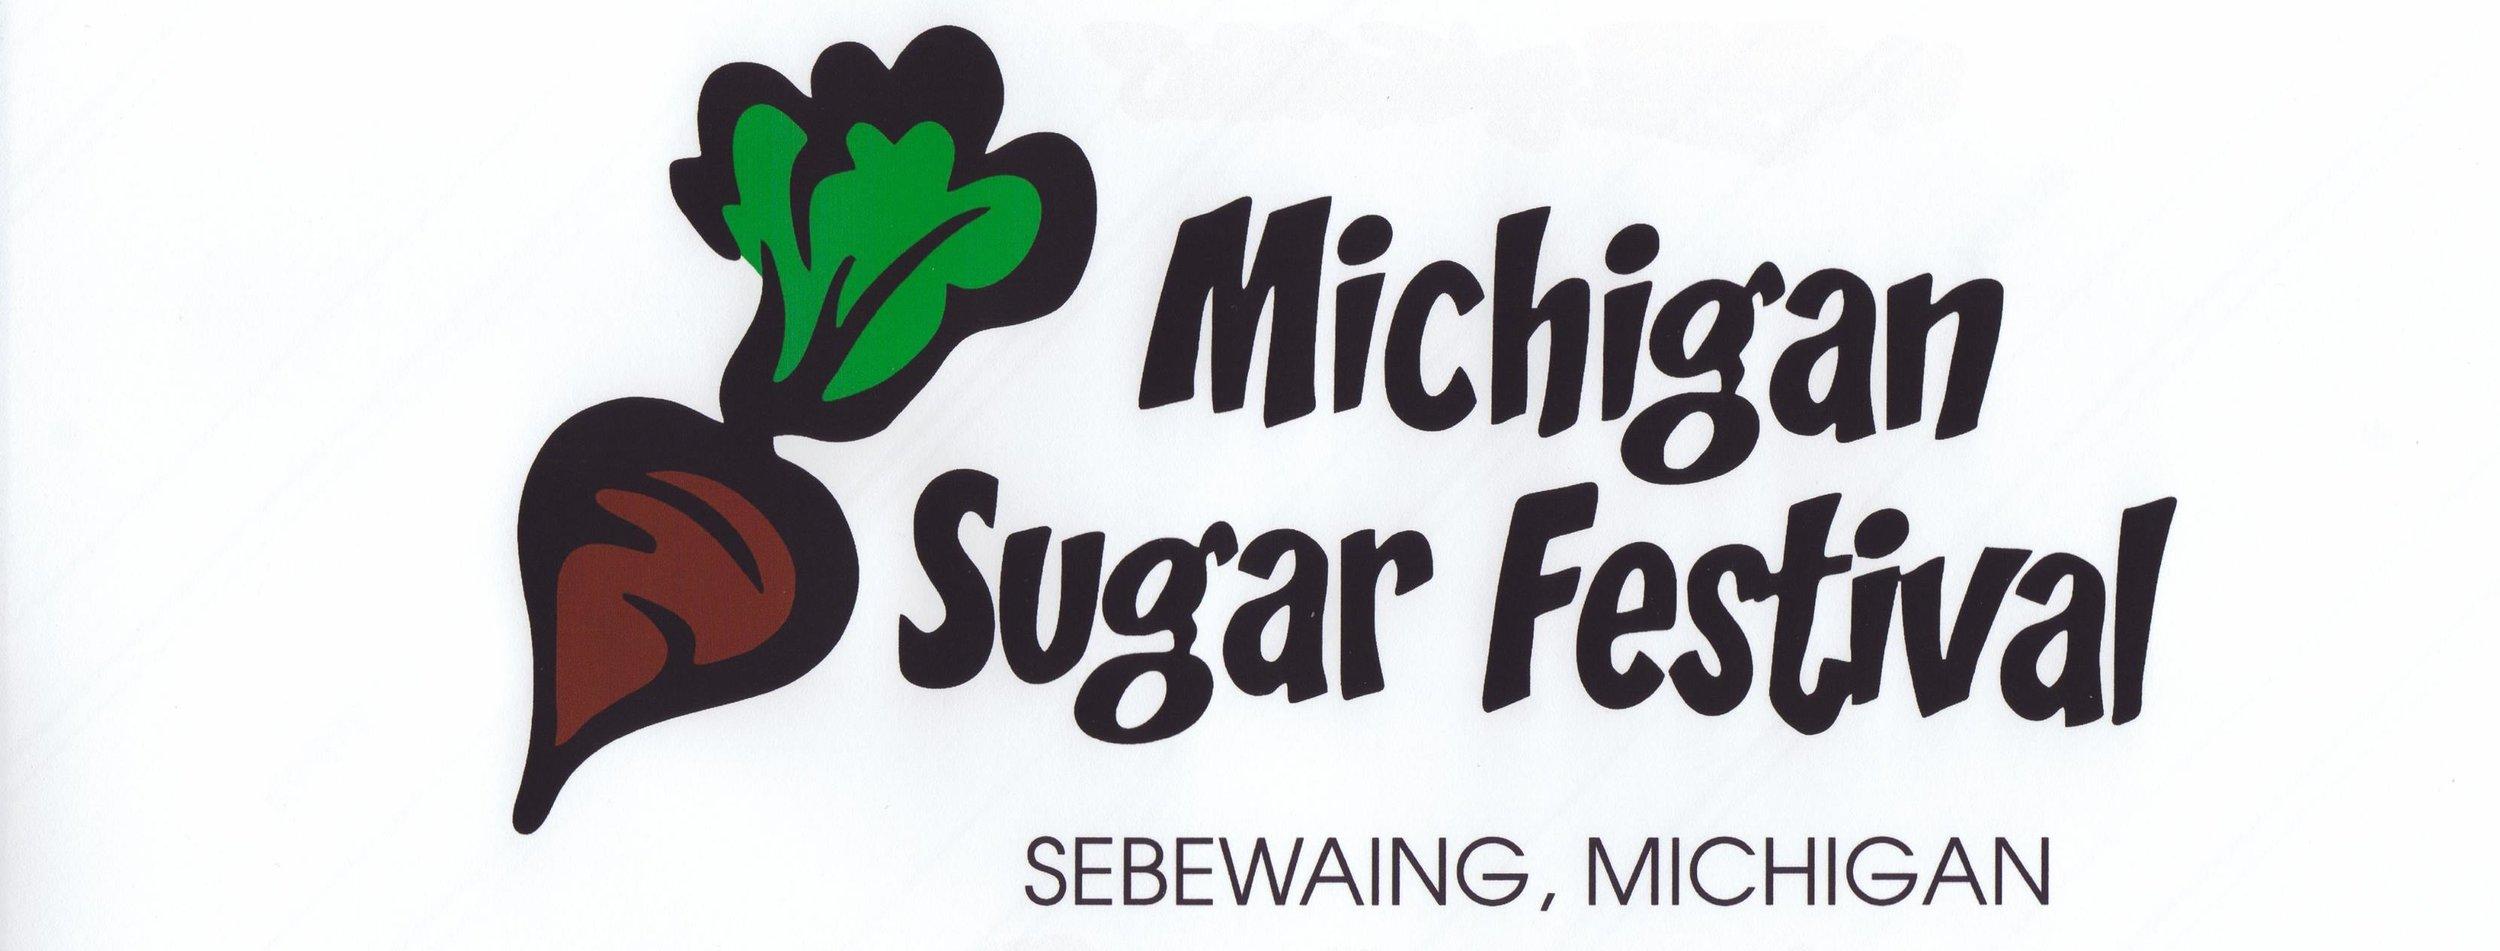 53rd Michigan Sugar Festival Banner